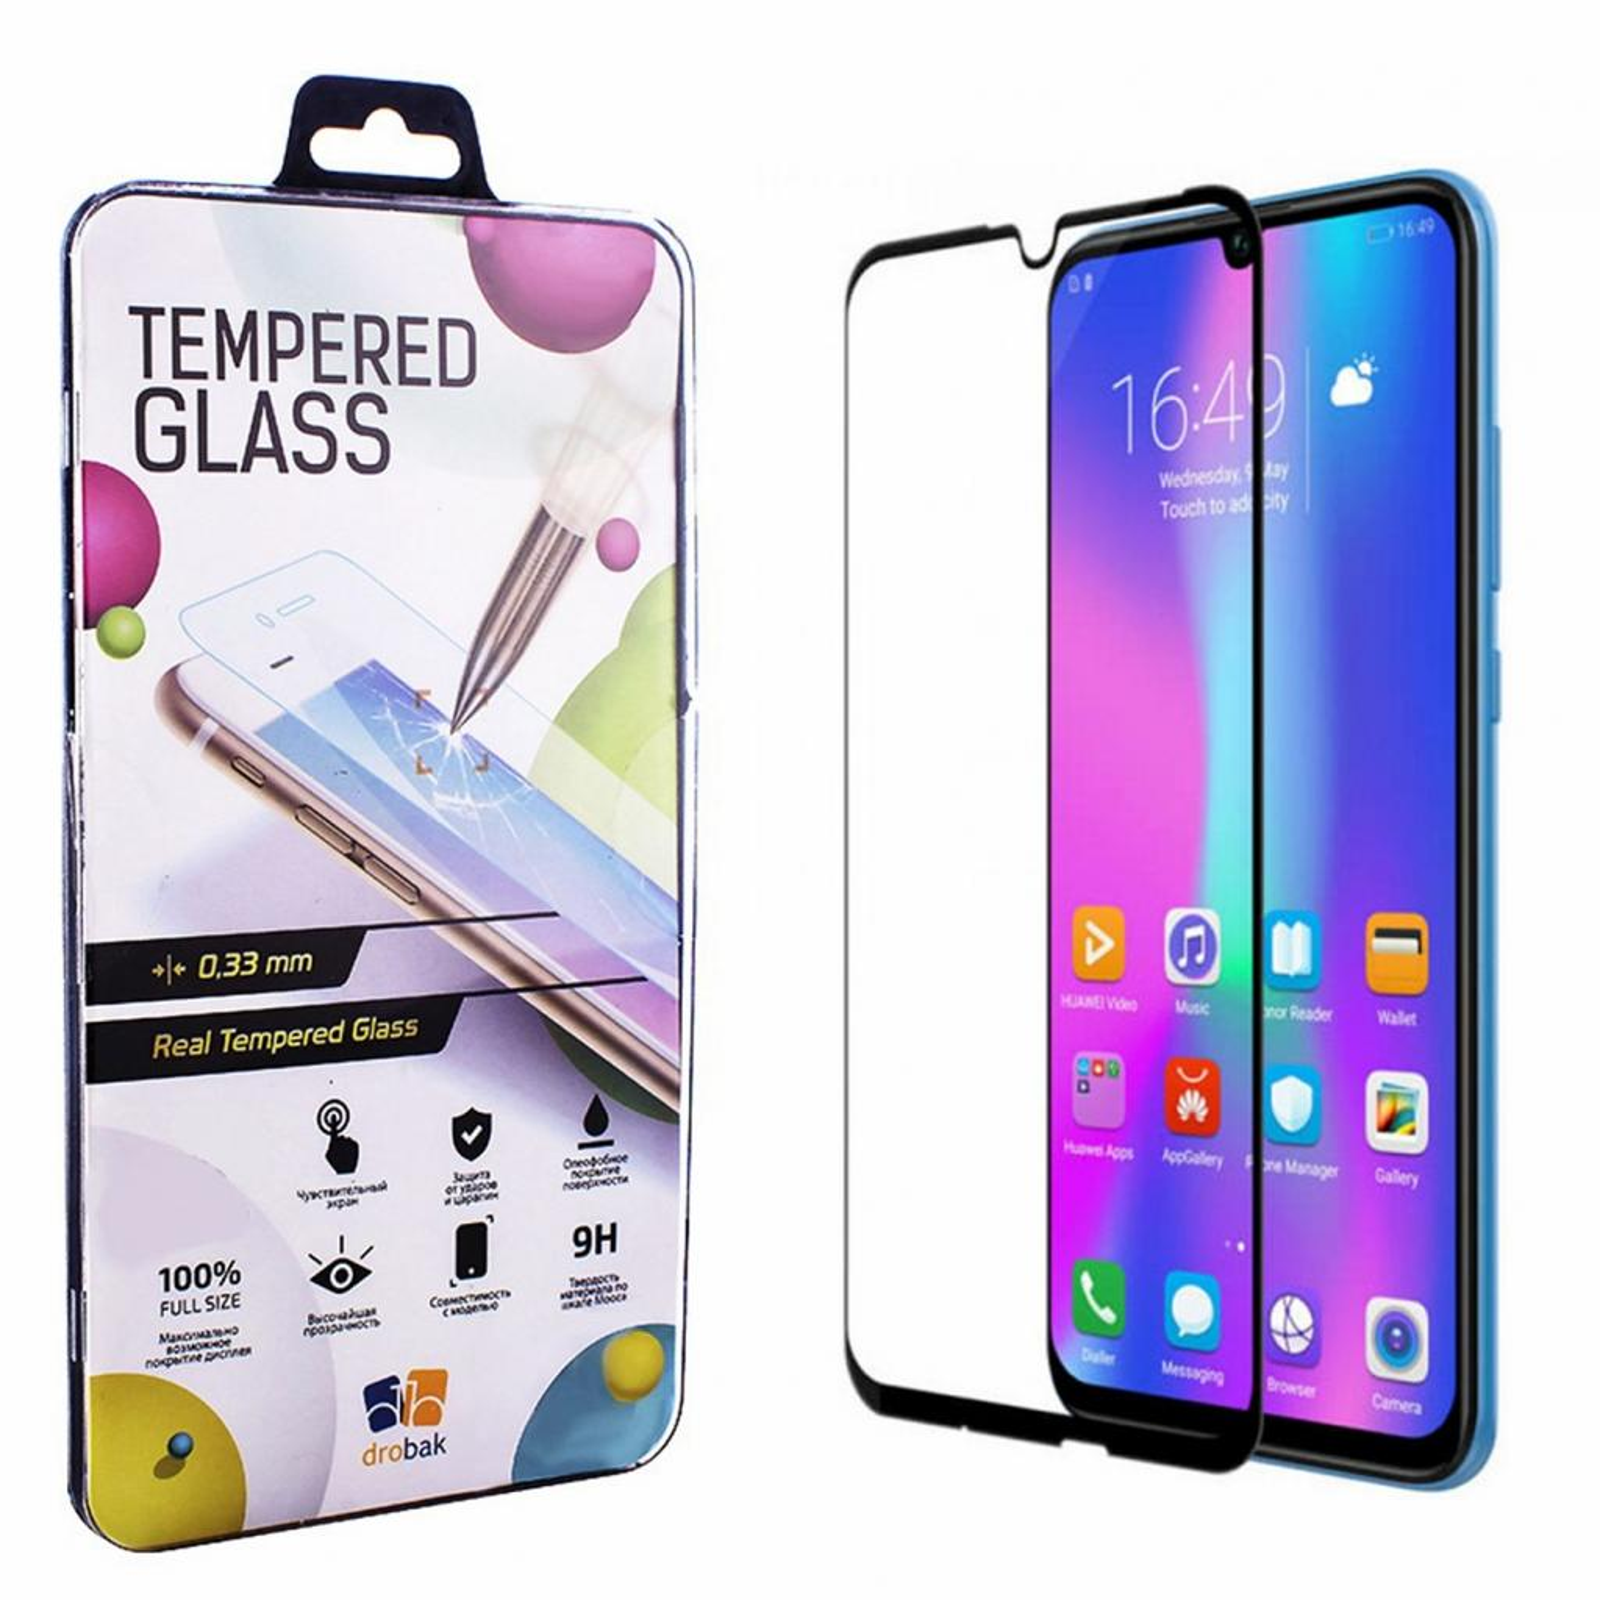 Стекло защитное Drobak для Huawei P Smart 2019 (Black) (448426)